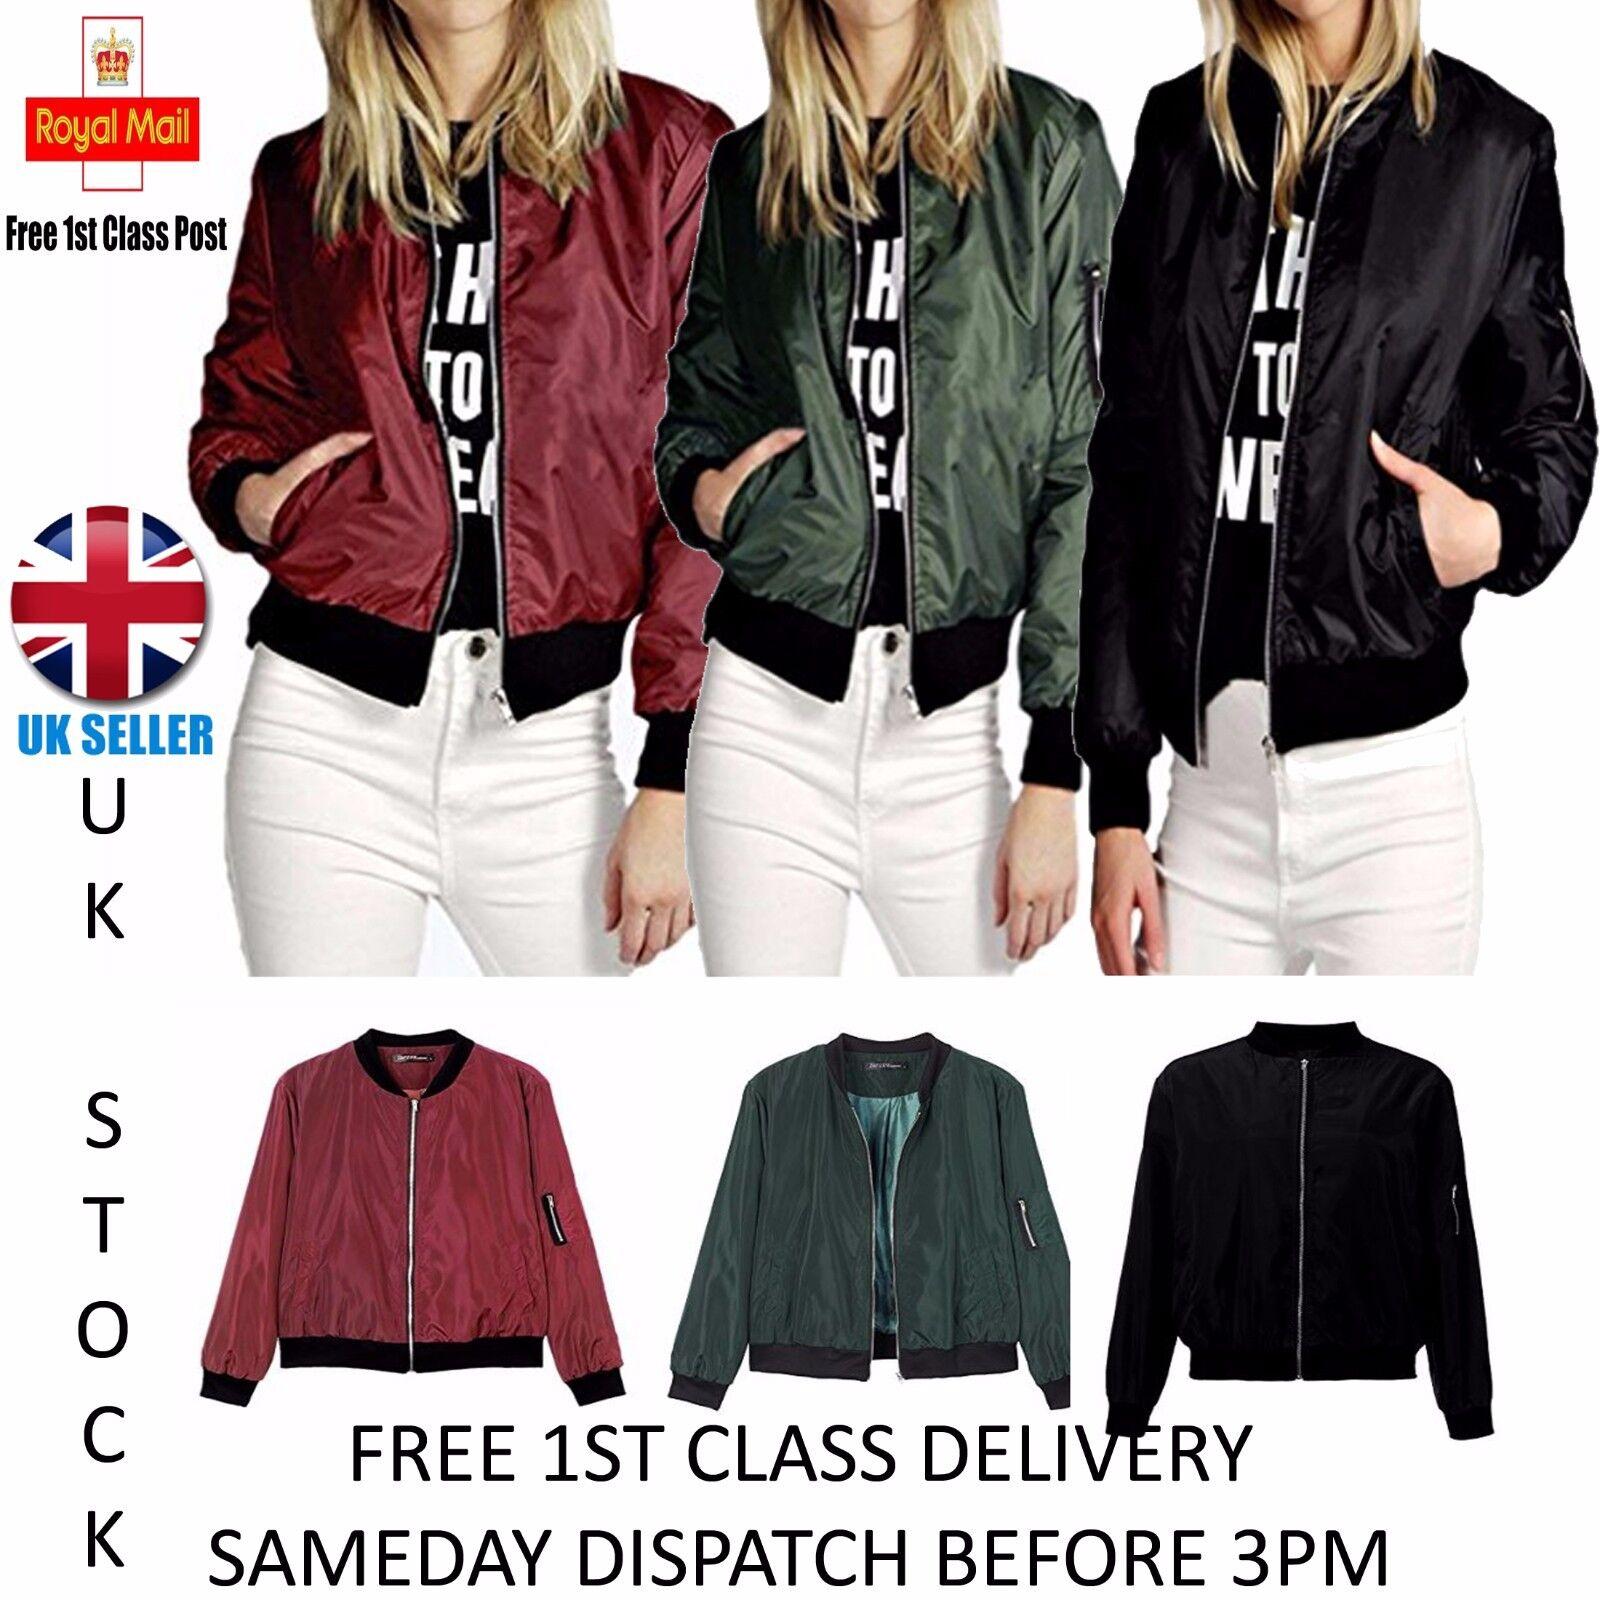 Ladies Harrington Classic Vintage Retro 1970/'s Bomber Jacket Sizes 8 to 12